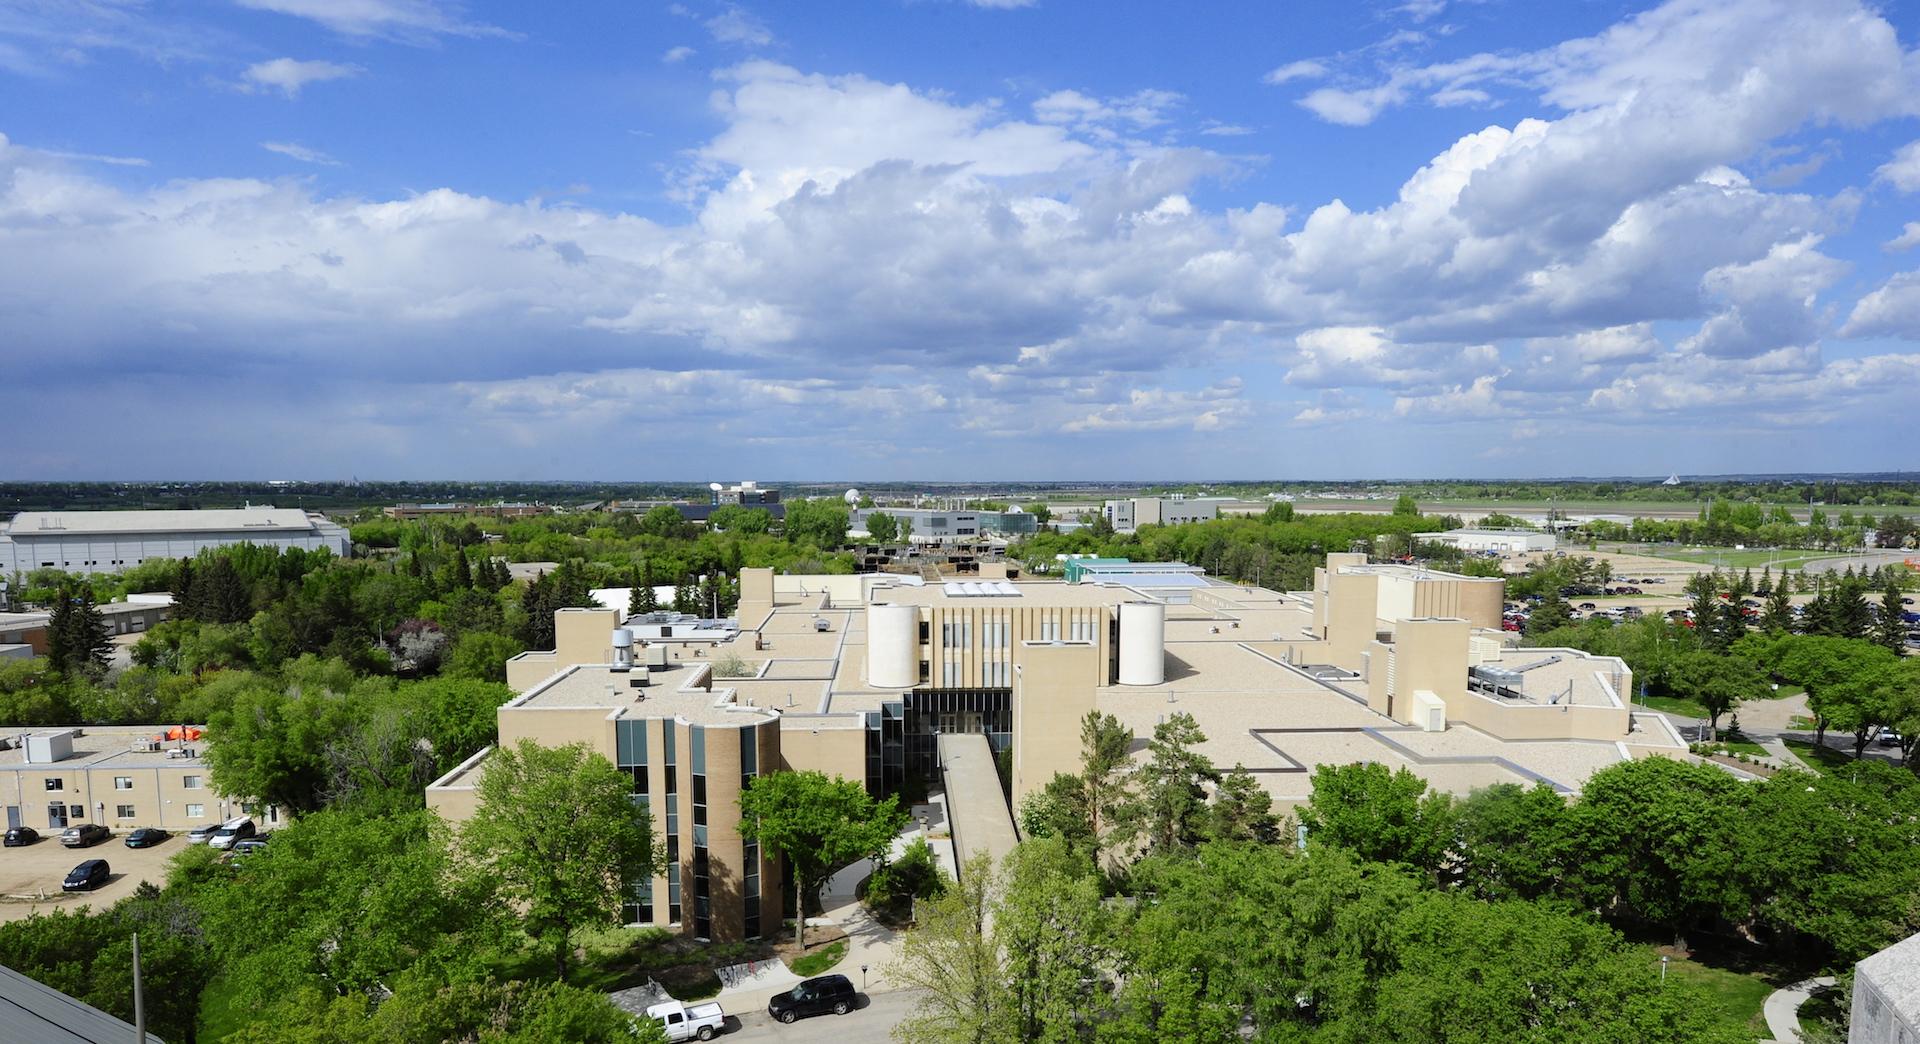 WCVM at University of Saskatchewan Maintains Full Accreditation